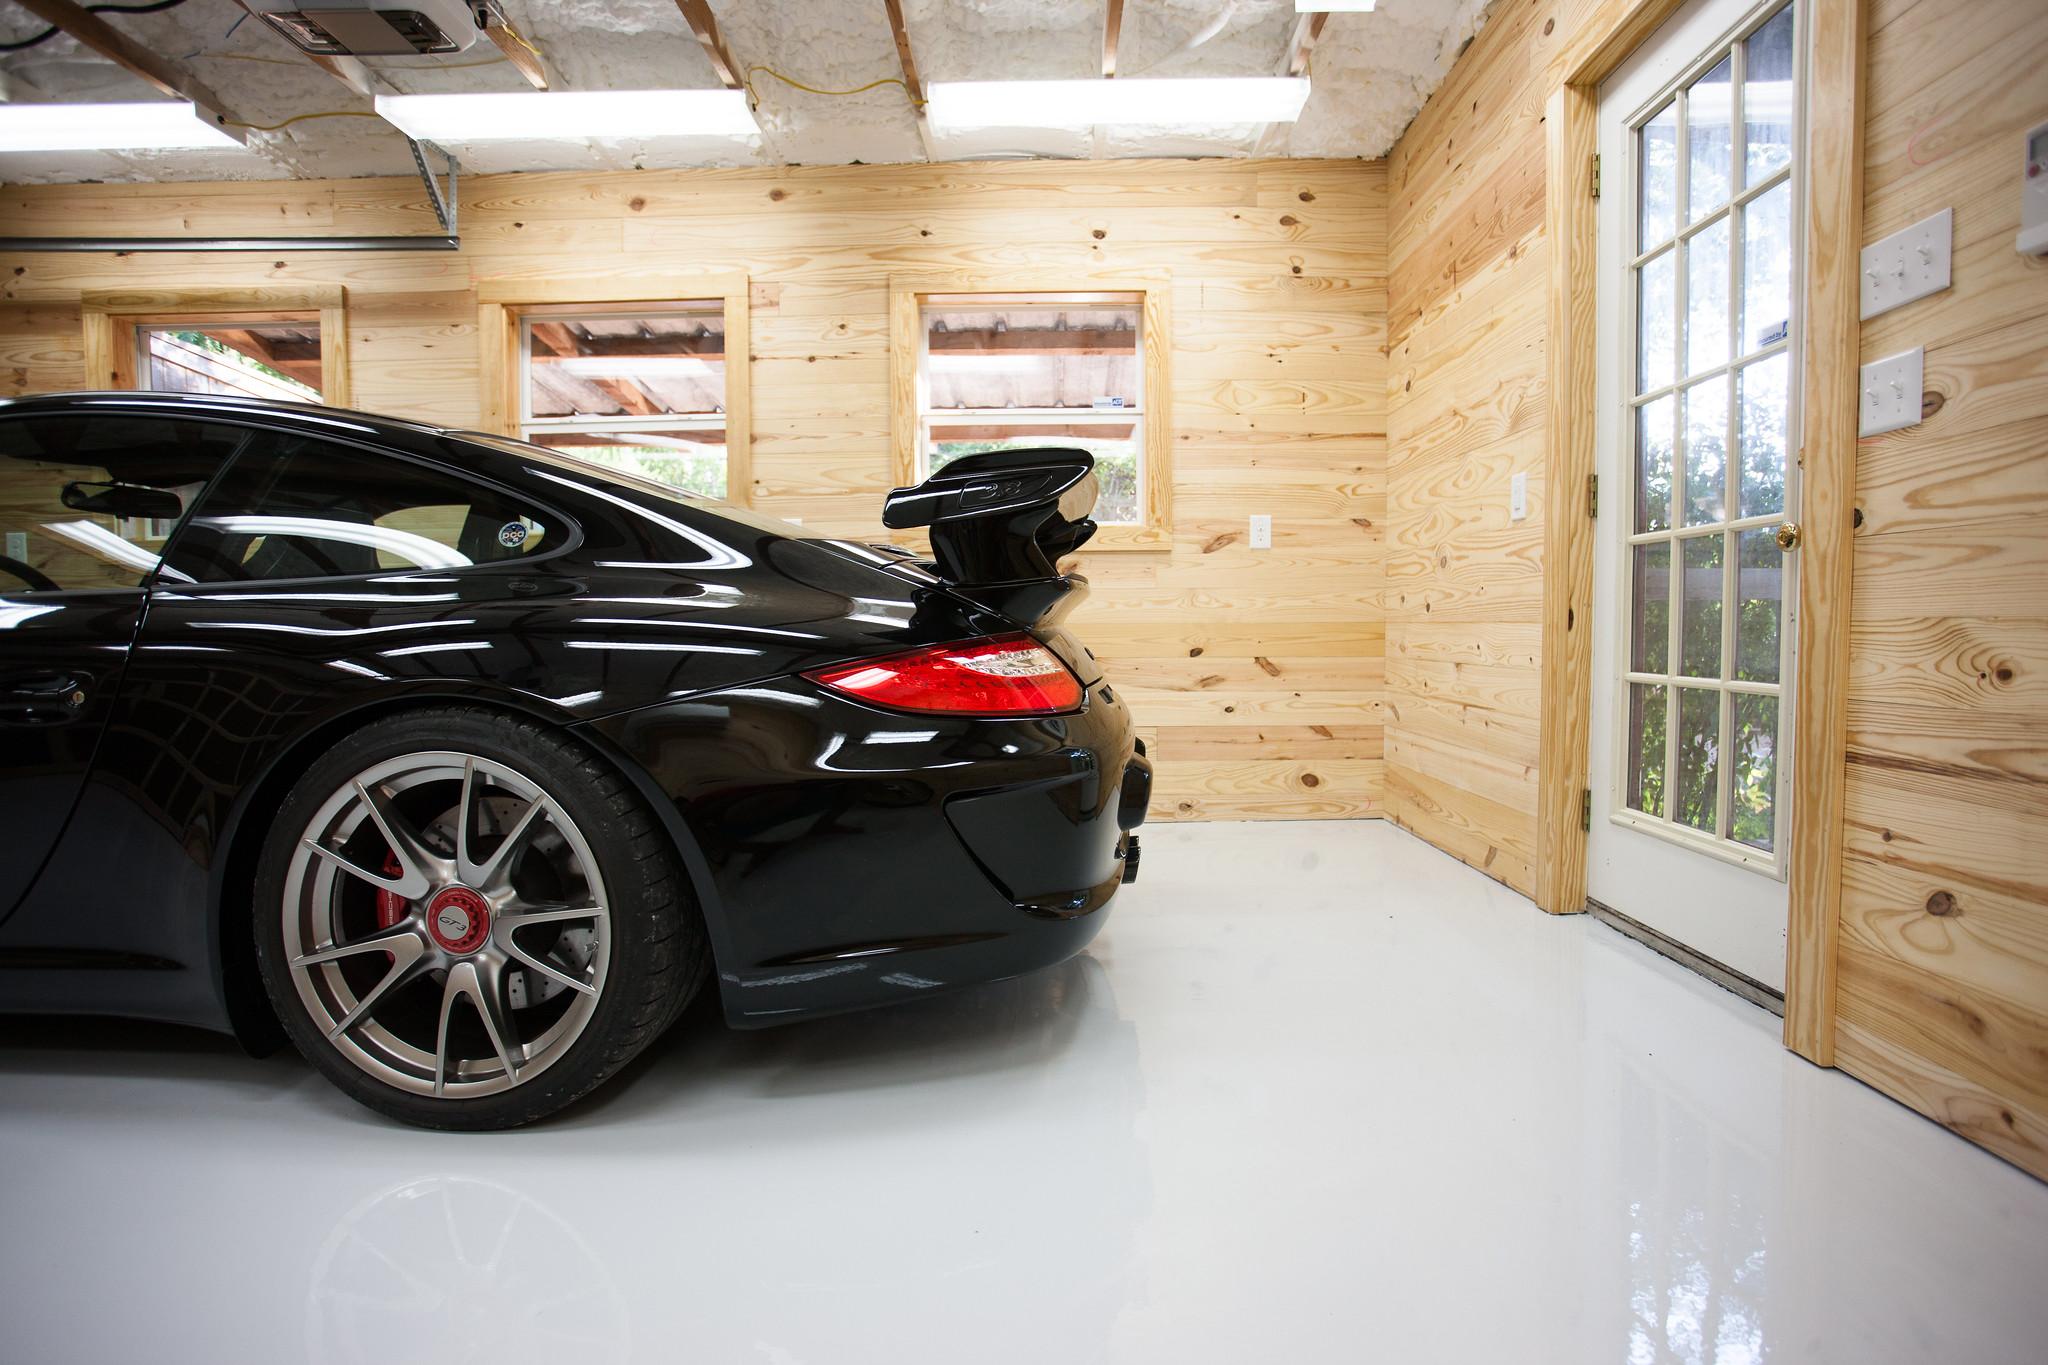 Porsche Of Annapolis >> picture of your garage - Page 2 - Rennlist - Porsche Discussion Forums